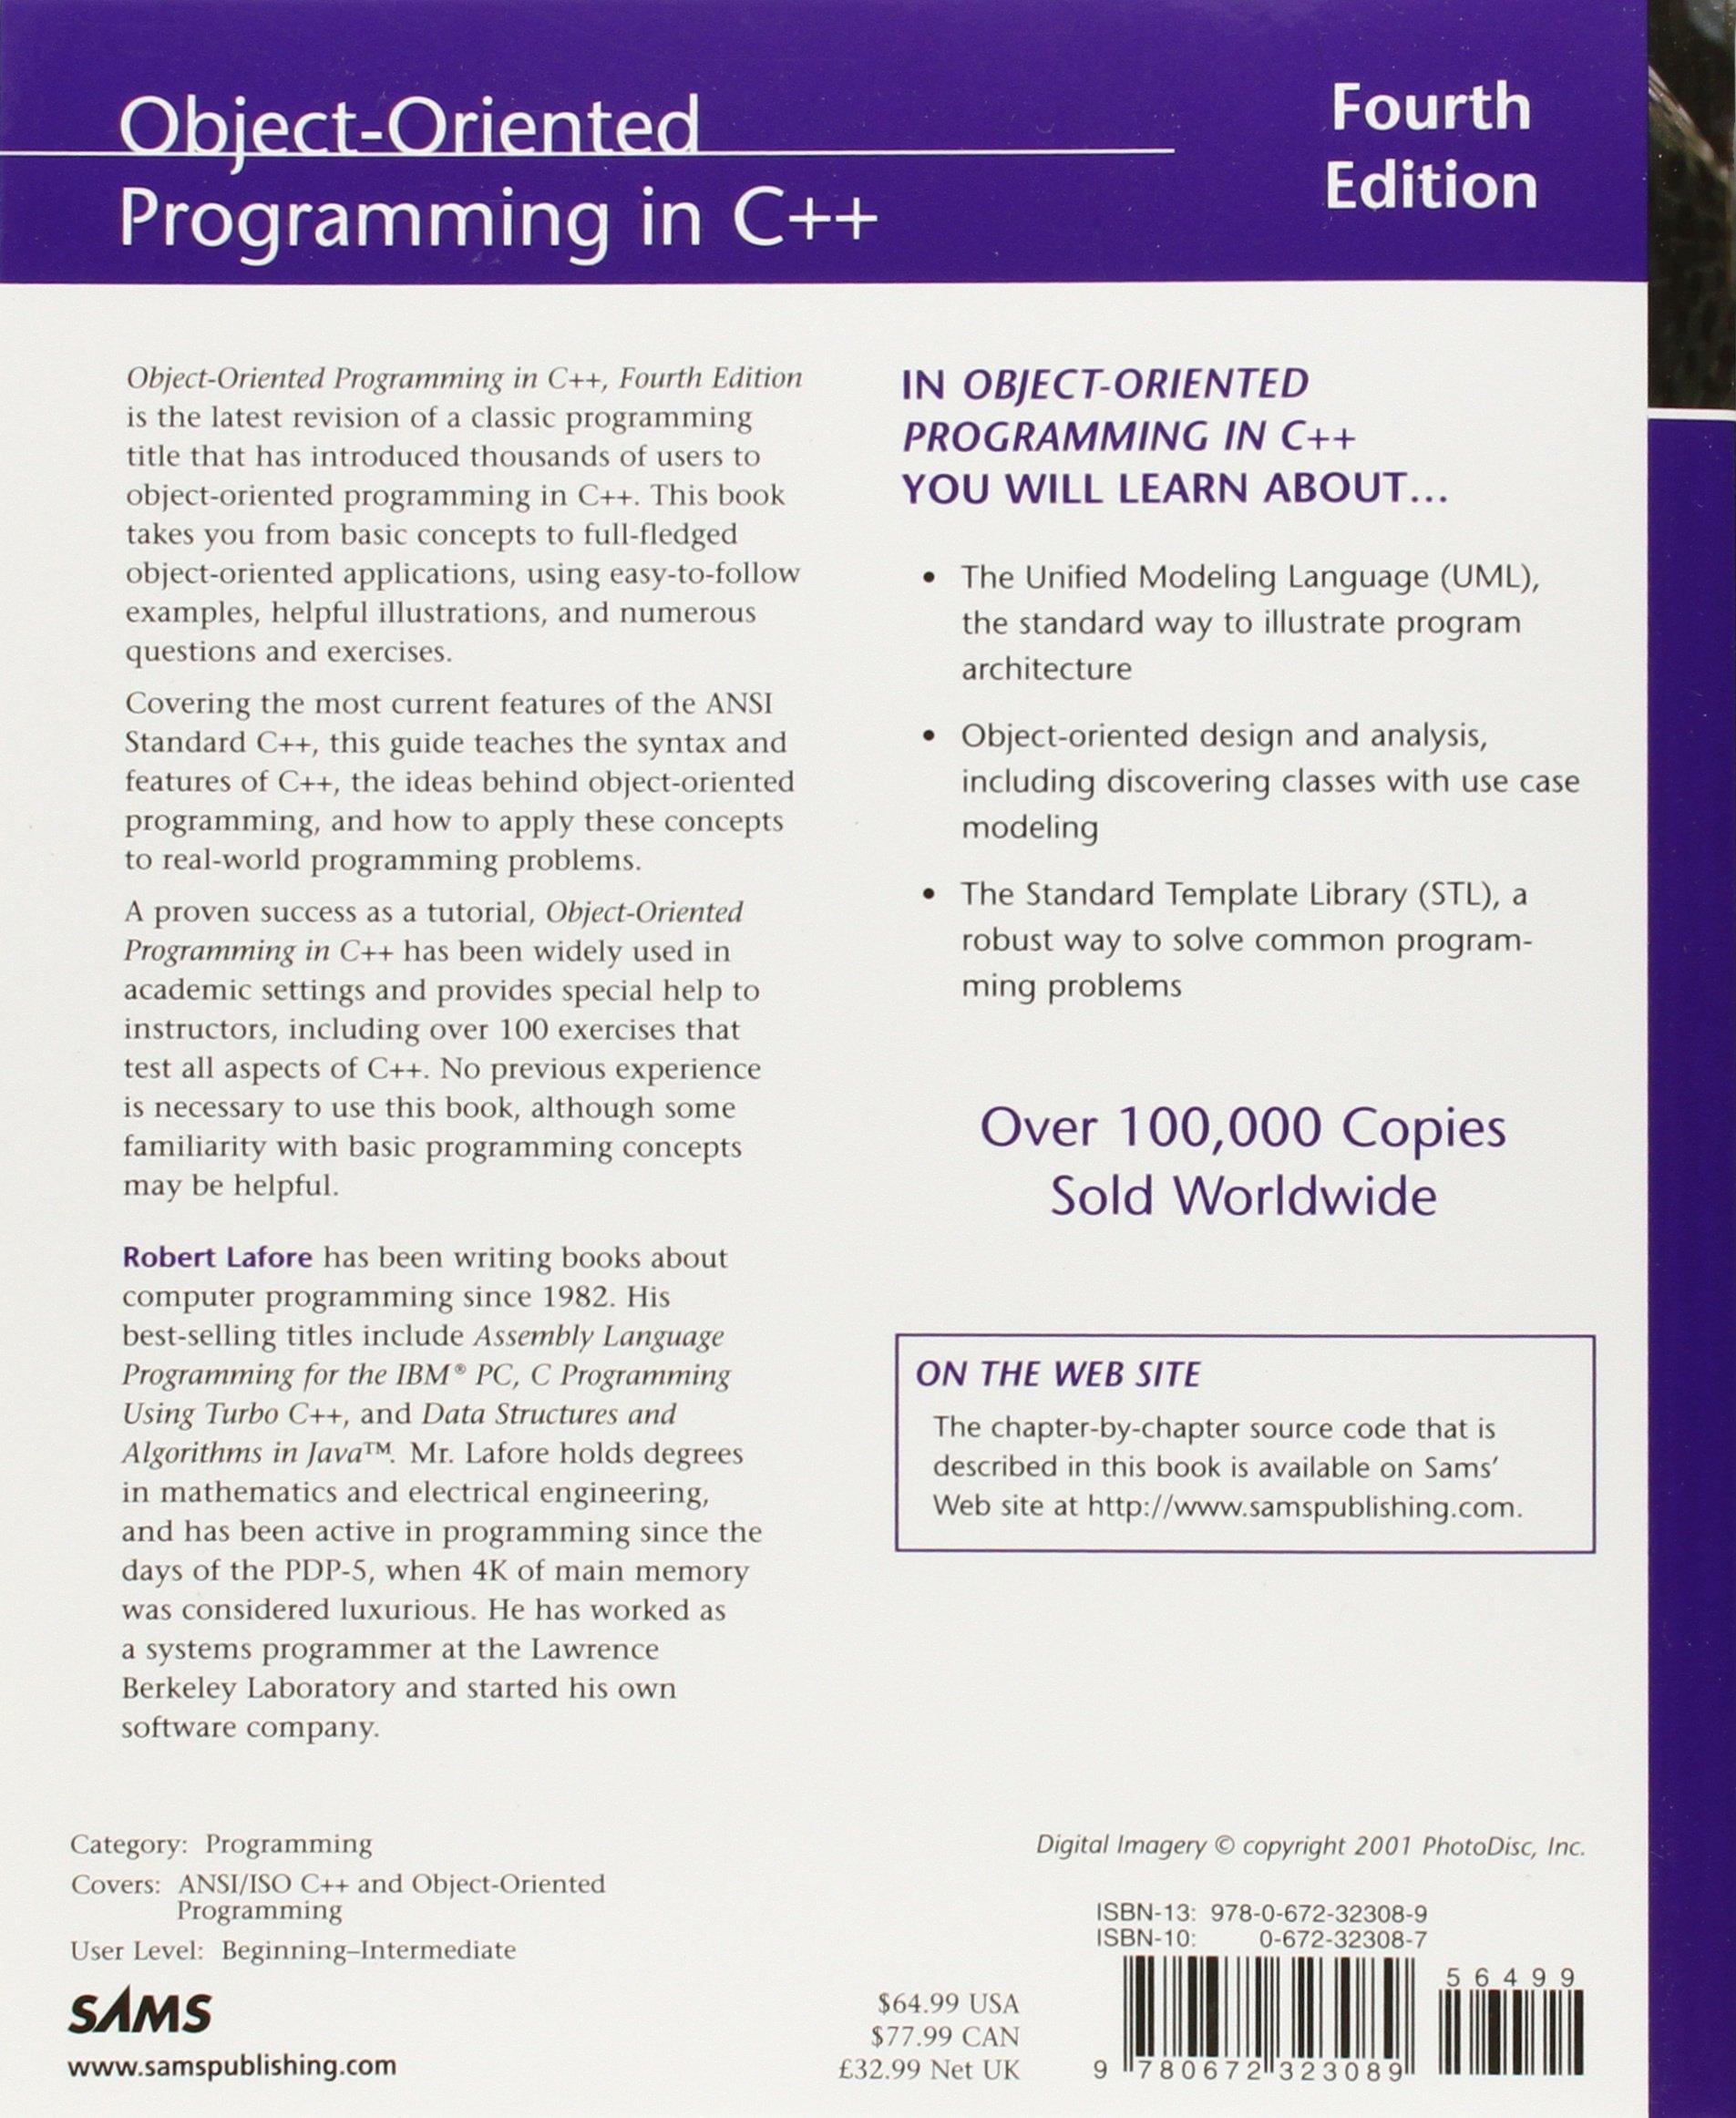 Object oriented programming in c kaleidoscope amazon object oriented programming in c kaleidoscope amazon robert lafore 9780672323089 books baditri Image collections